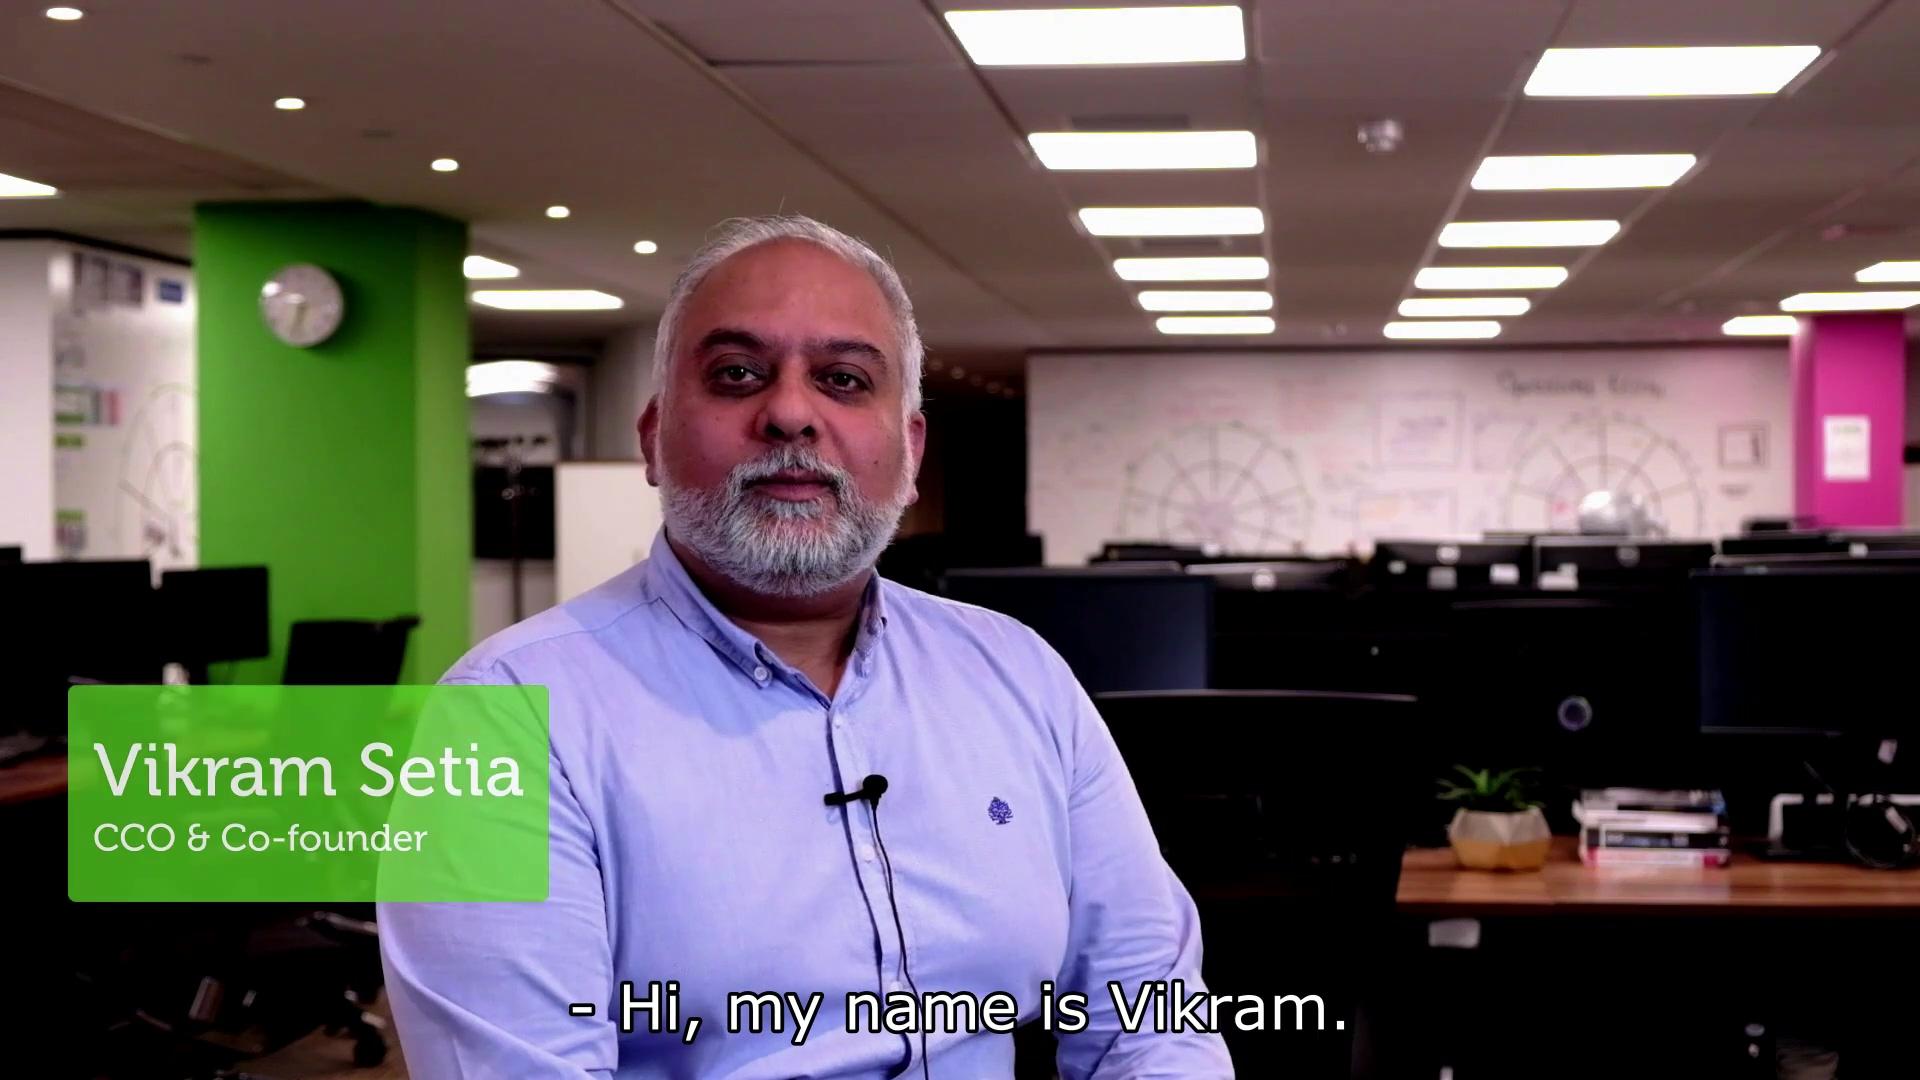 Vikrams intro subtitles